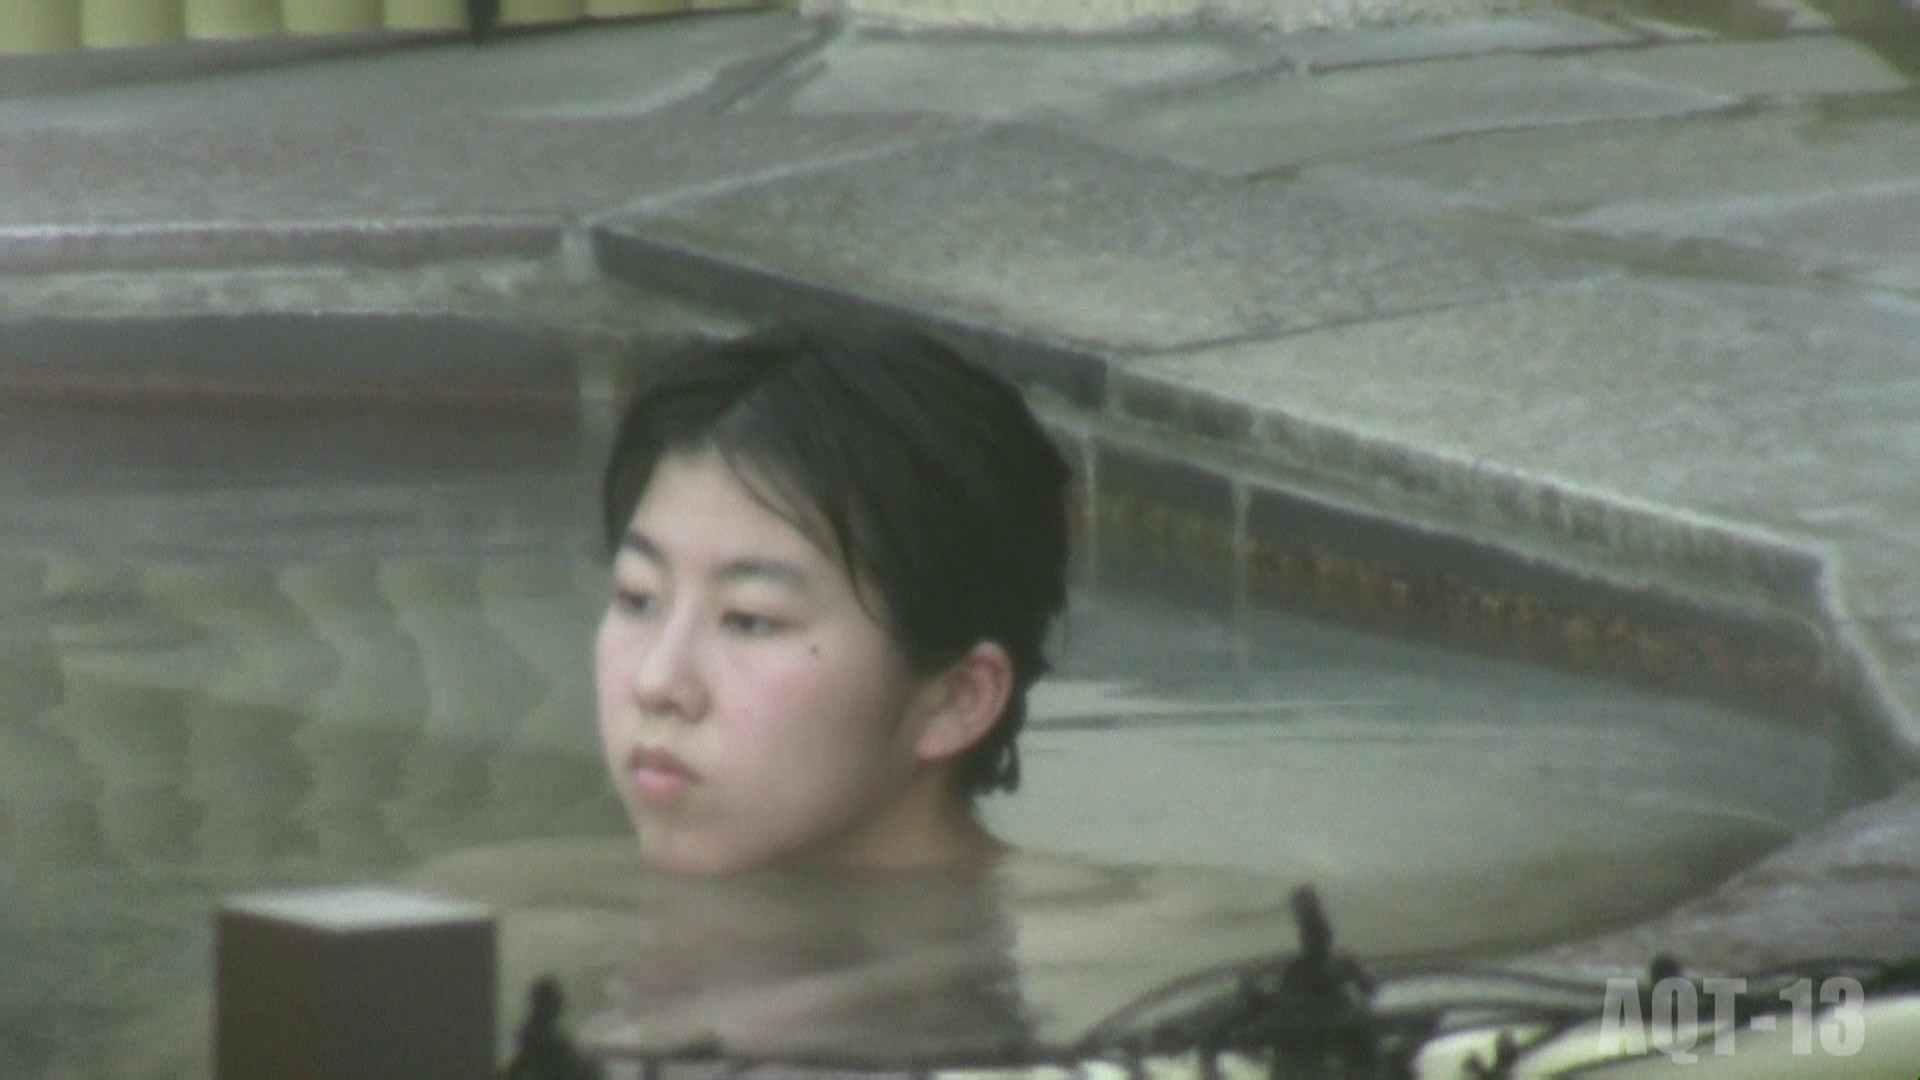 Aquaな露天風呂Vol.816 OLセックス | 露天  80画像 37